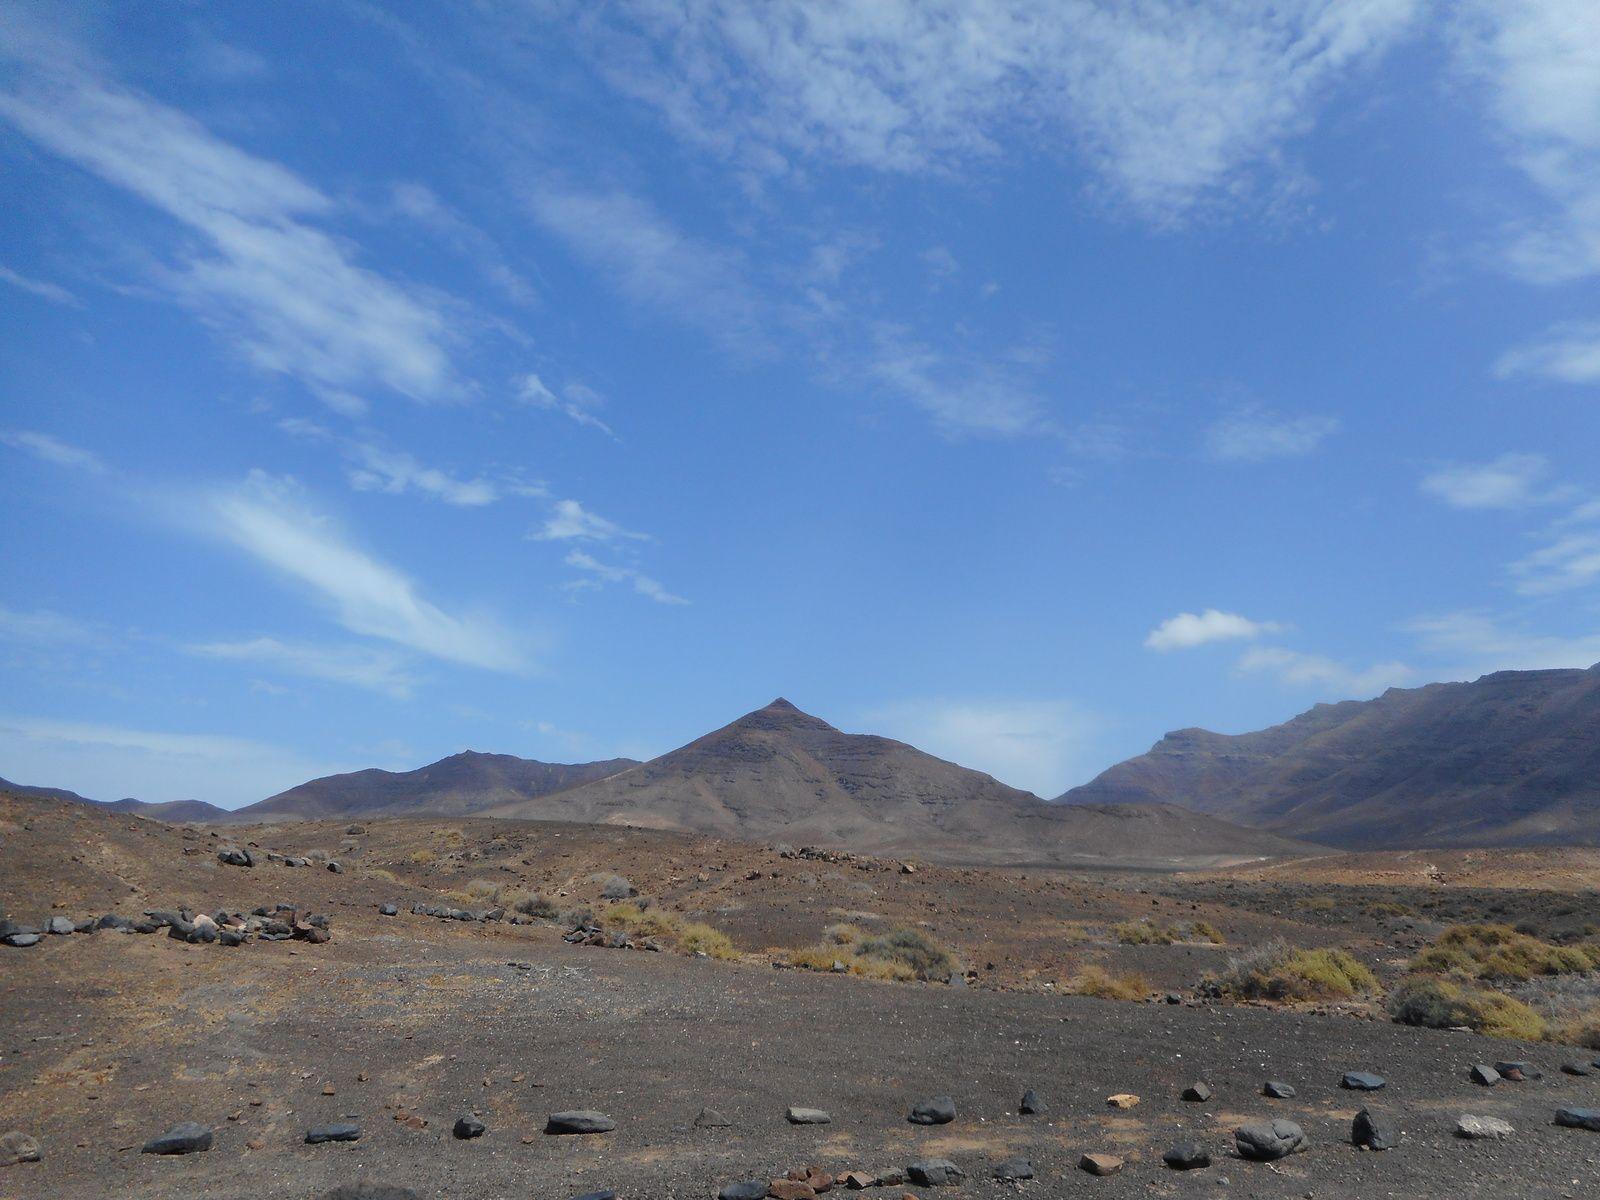 Le Sud de l'Île de Fuerteventura